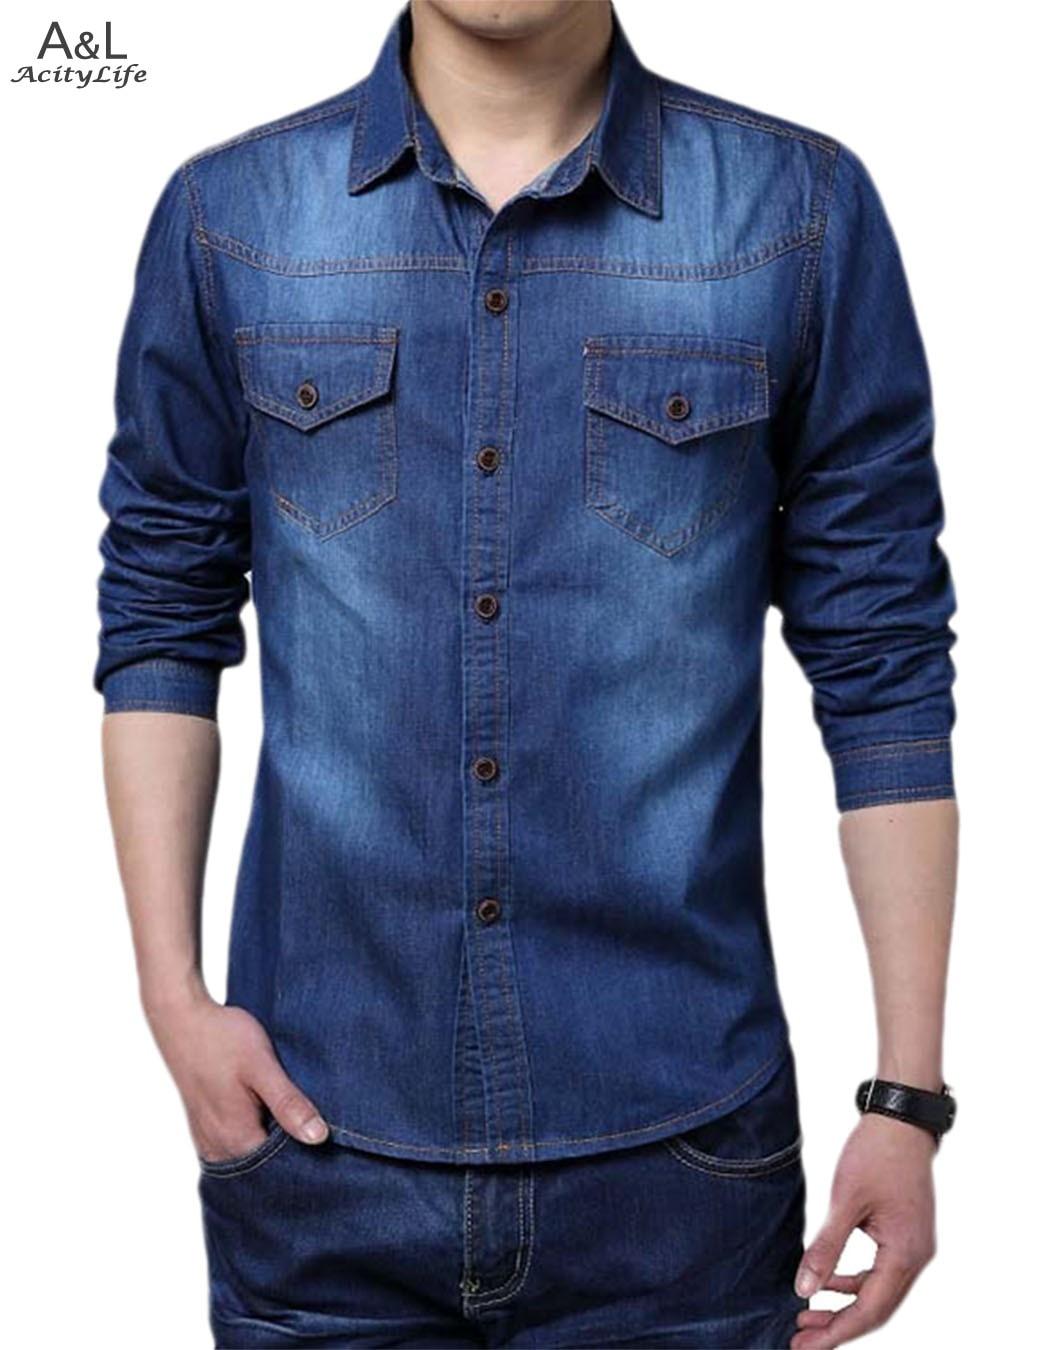 Big Size Men Shirt Denim Large Size 5XL Cotton Turn-down Collar Button Pockets Men Jeans Shirts 2018 New Autumn Long Sleeve Blue